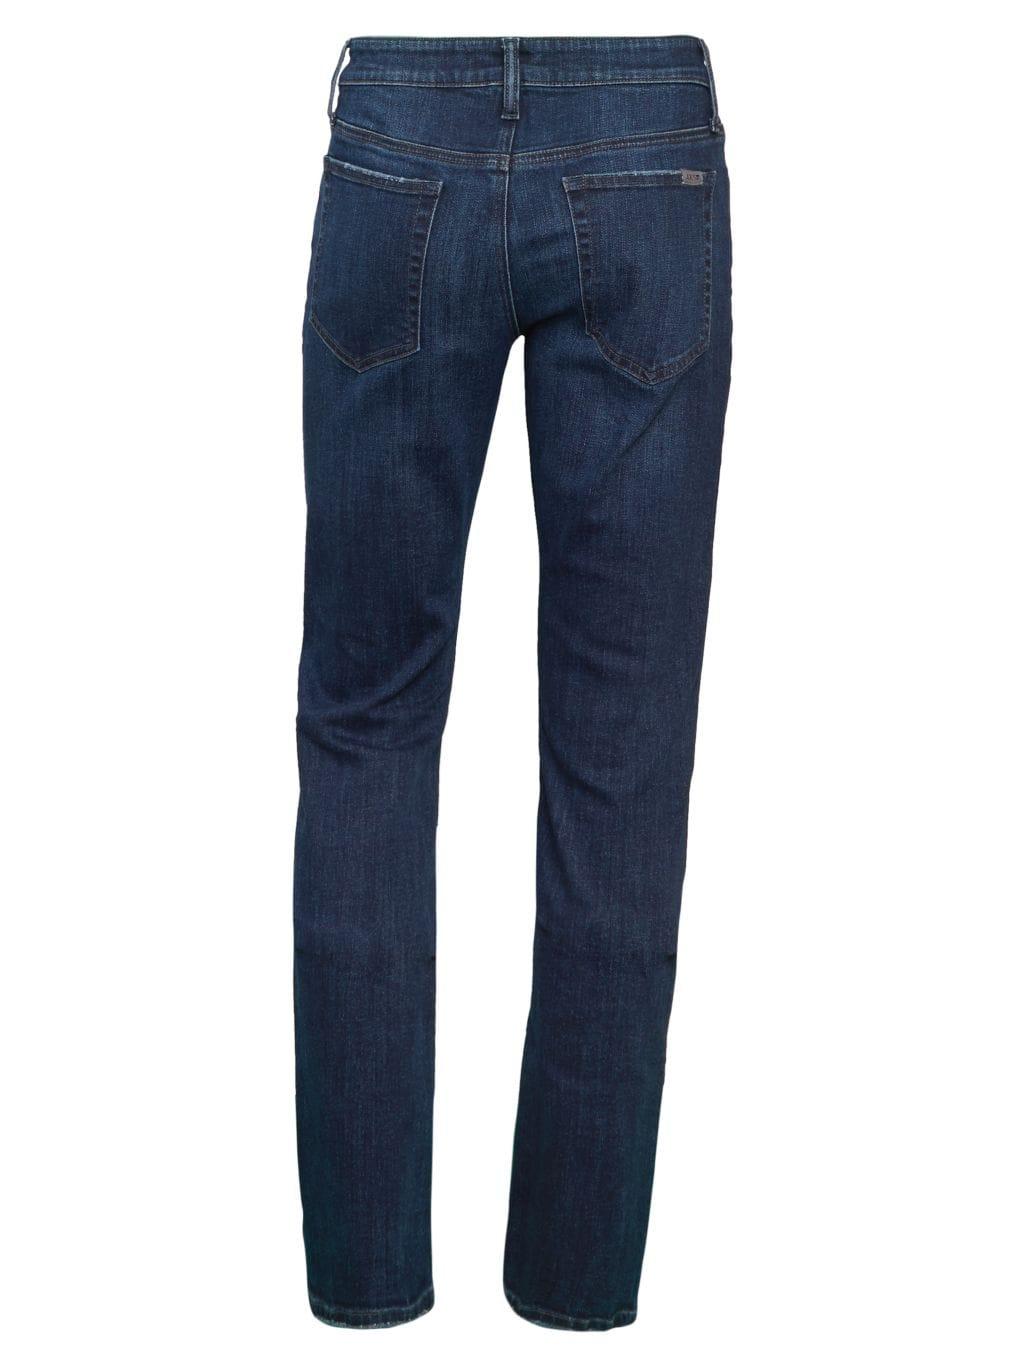 Joe's Jeans The Brixton Jeans